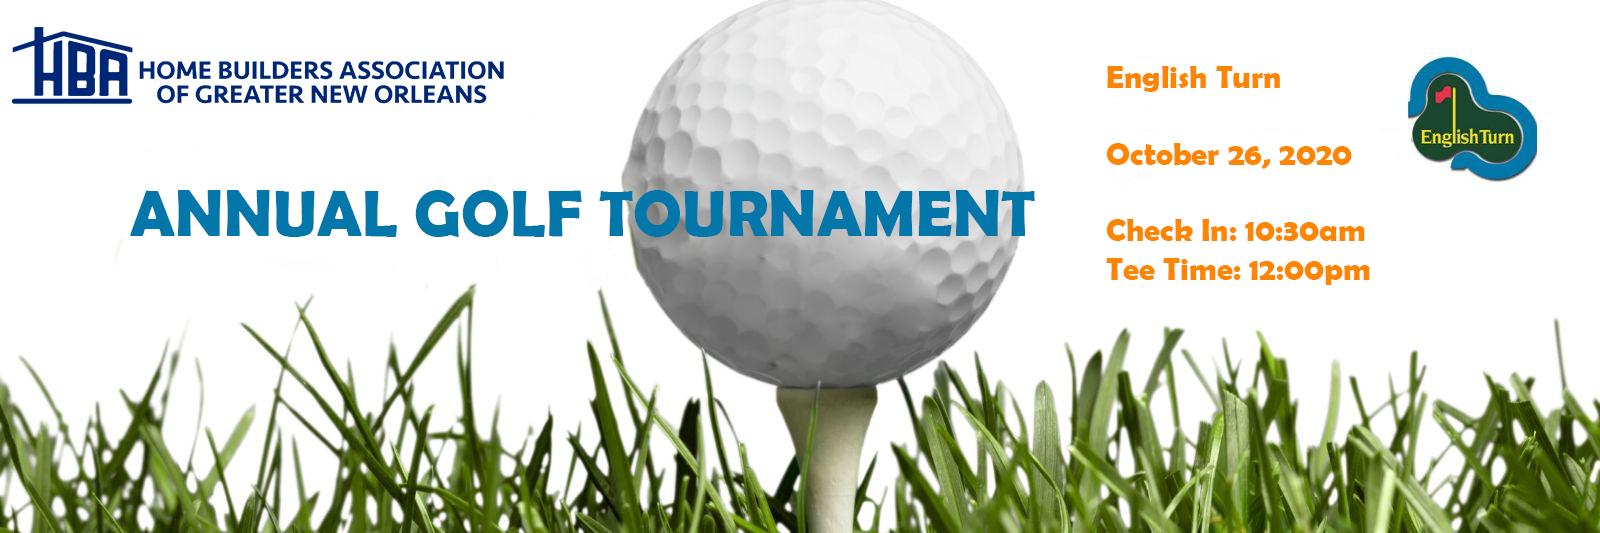 Golf-Tournament-(3).png